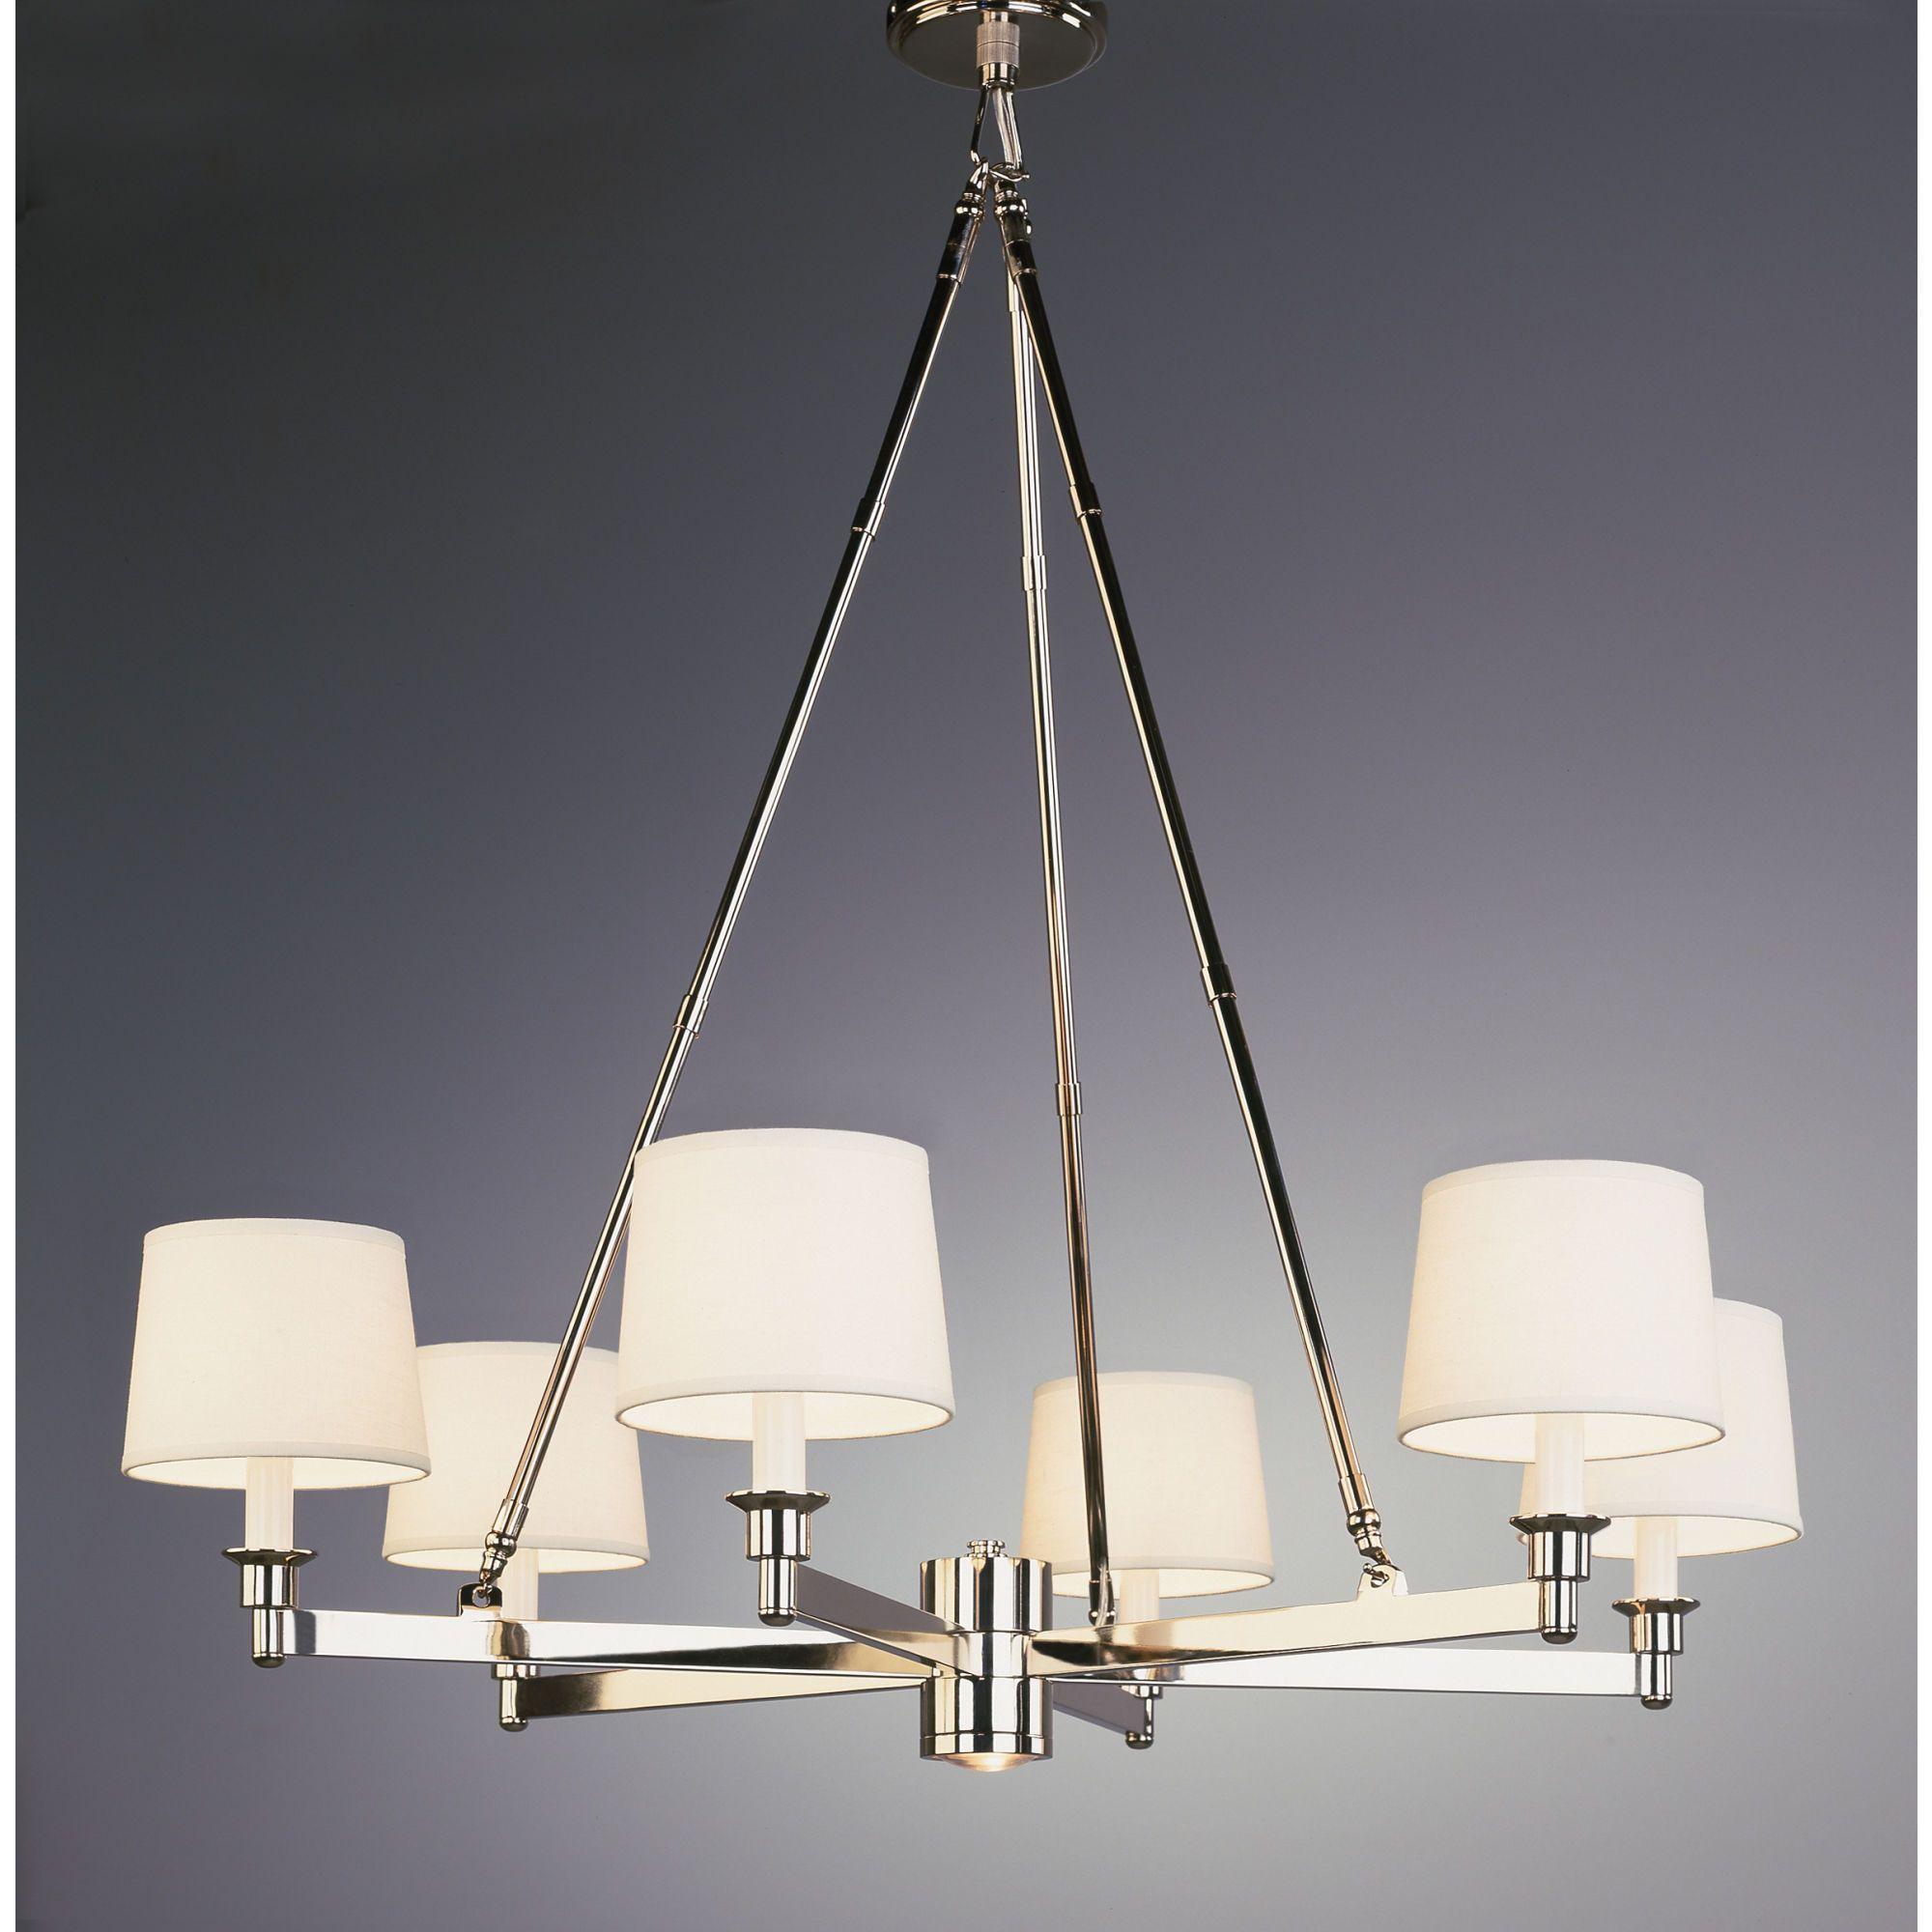 Modern Ceiling Dining Living Bedroom Crystal Chandelier Fixture Lamp Fixture Height 415mm Fixture Widt Chandelier Pendant Lights Hanging Lights Hanging Lamp